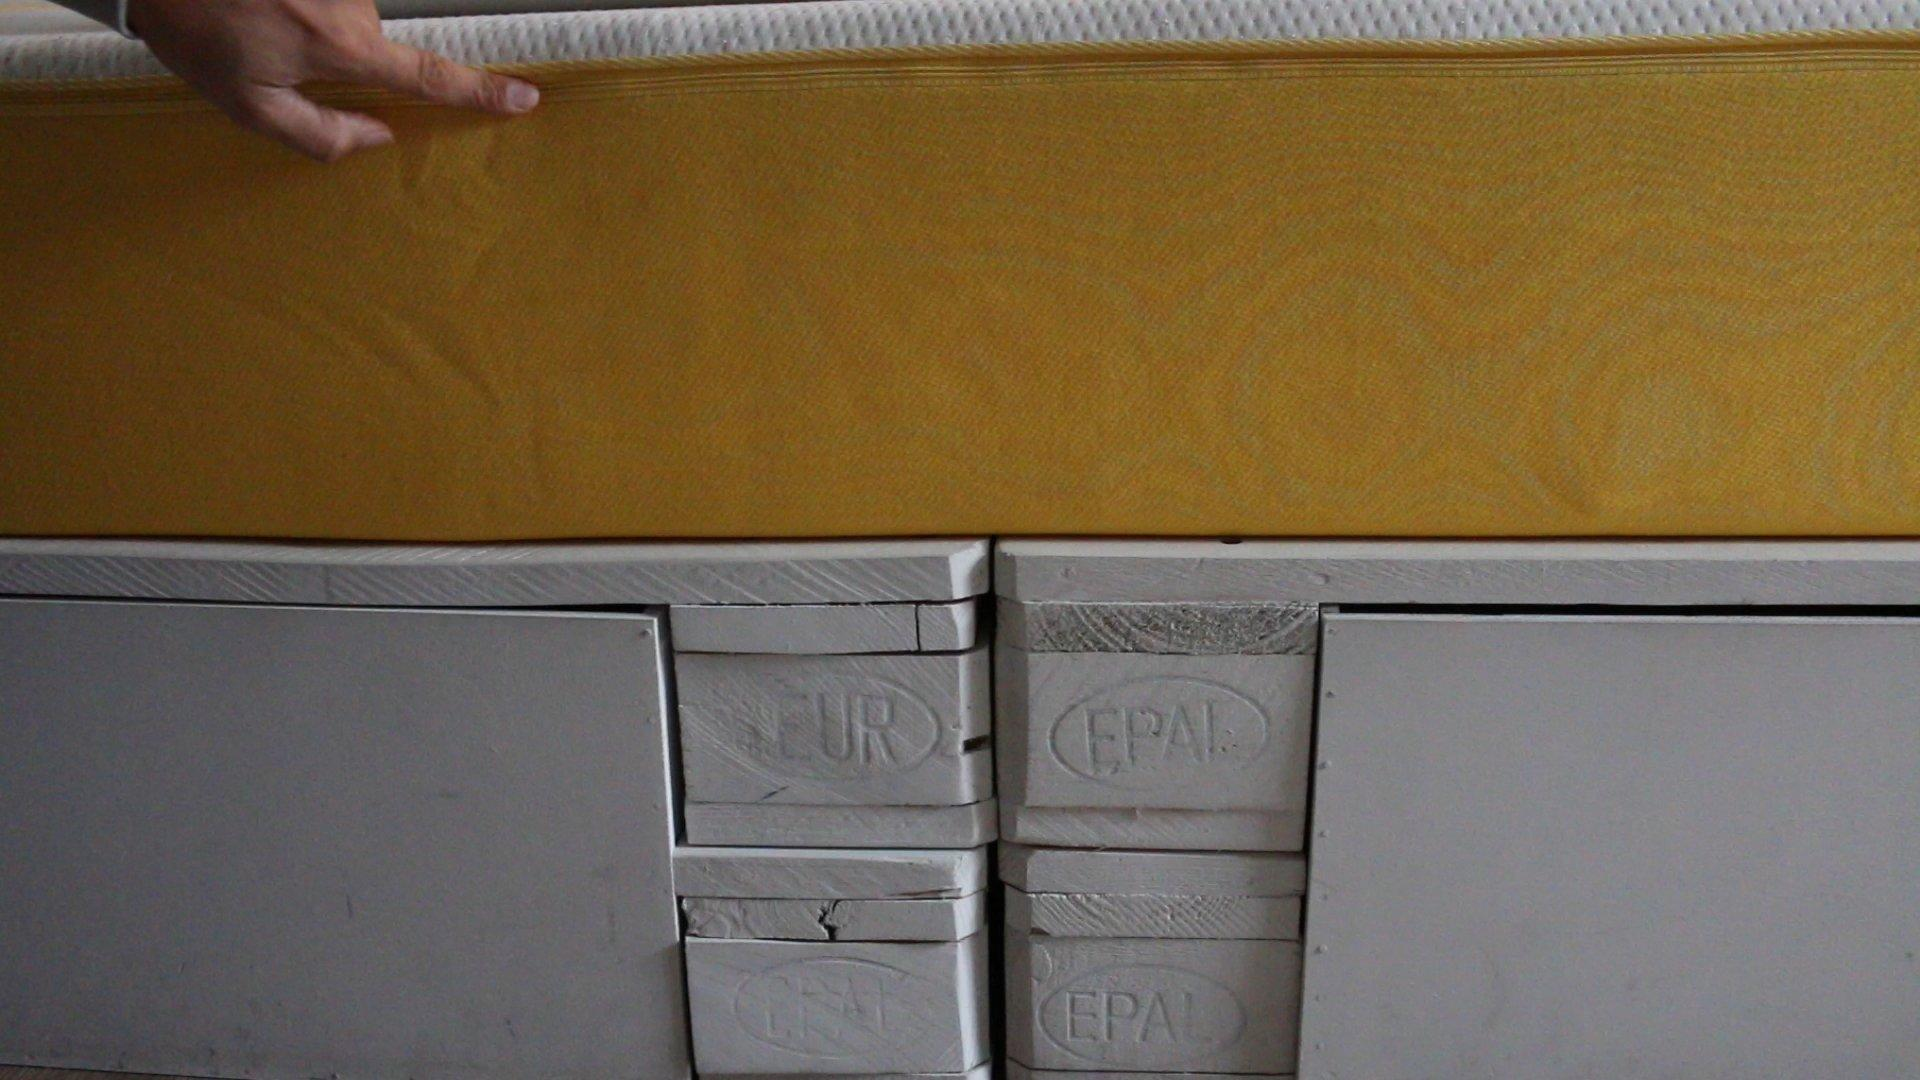 palettenbett selber bauen anleitungen shop. Black Bedroom Furniture Sets. Home Design Ideas